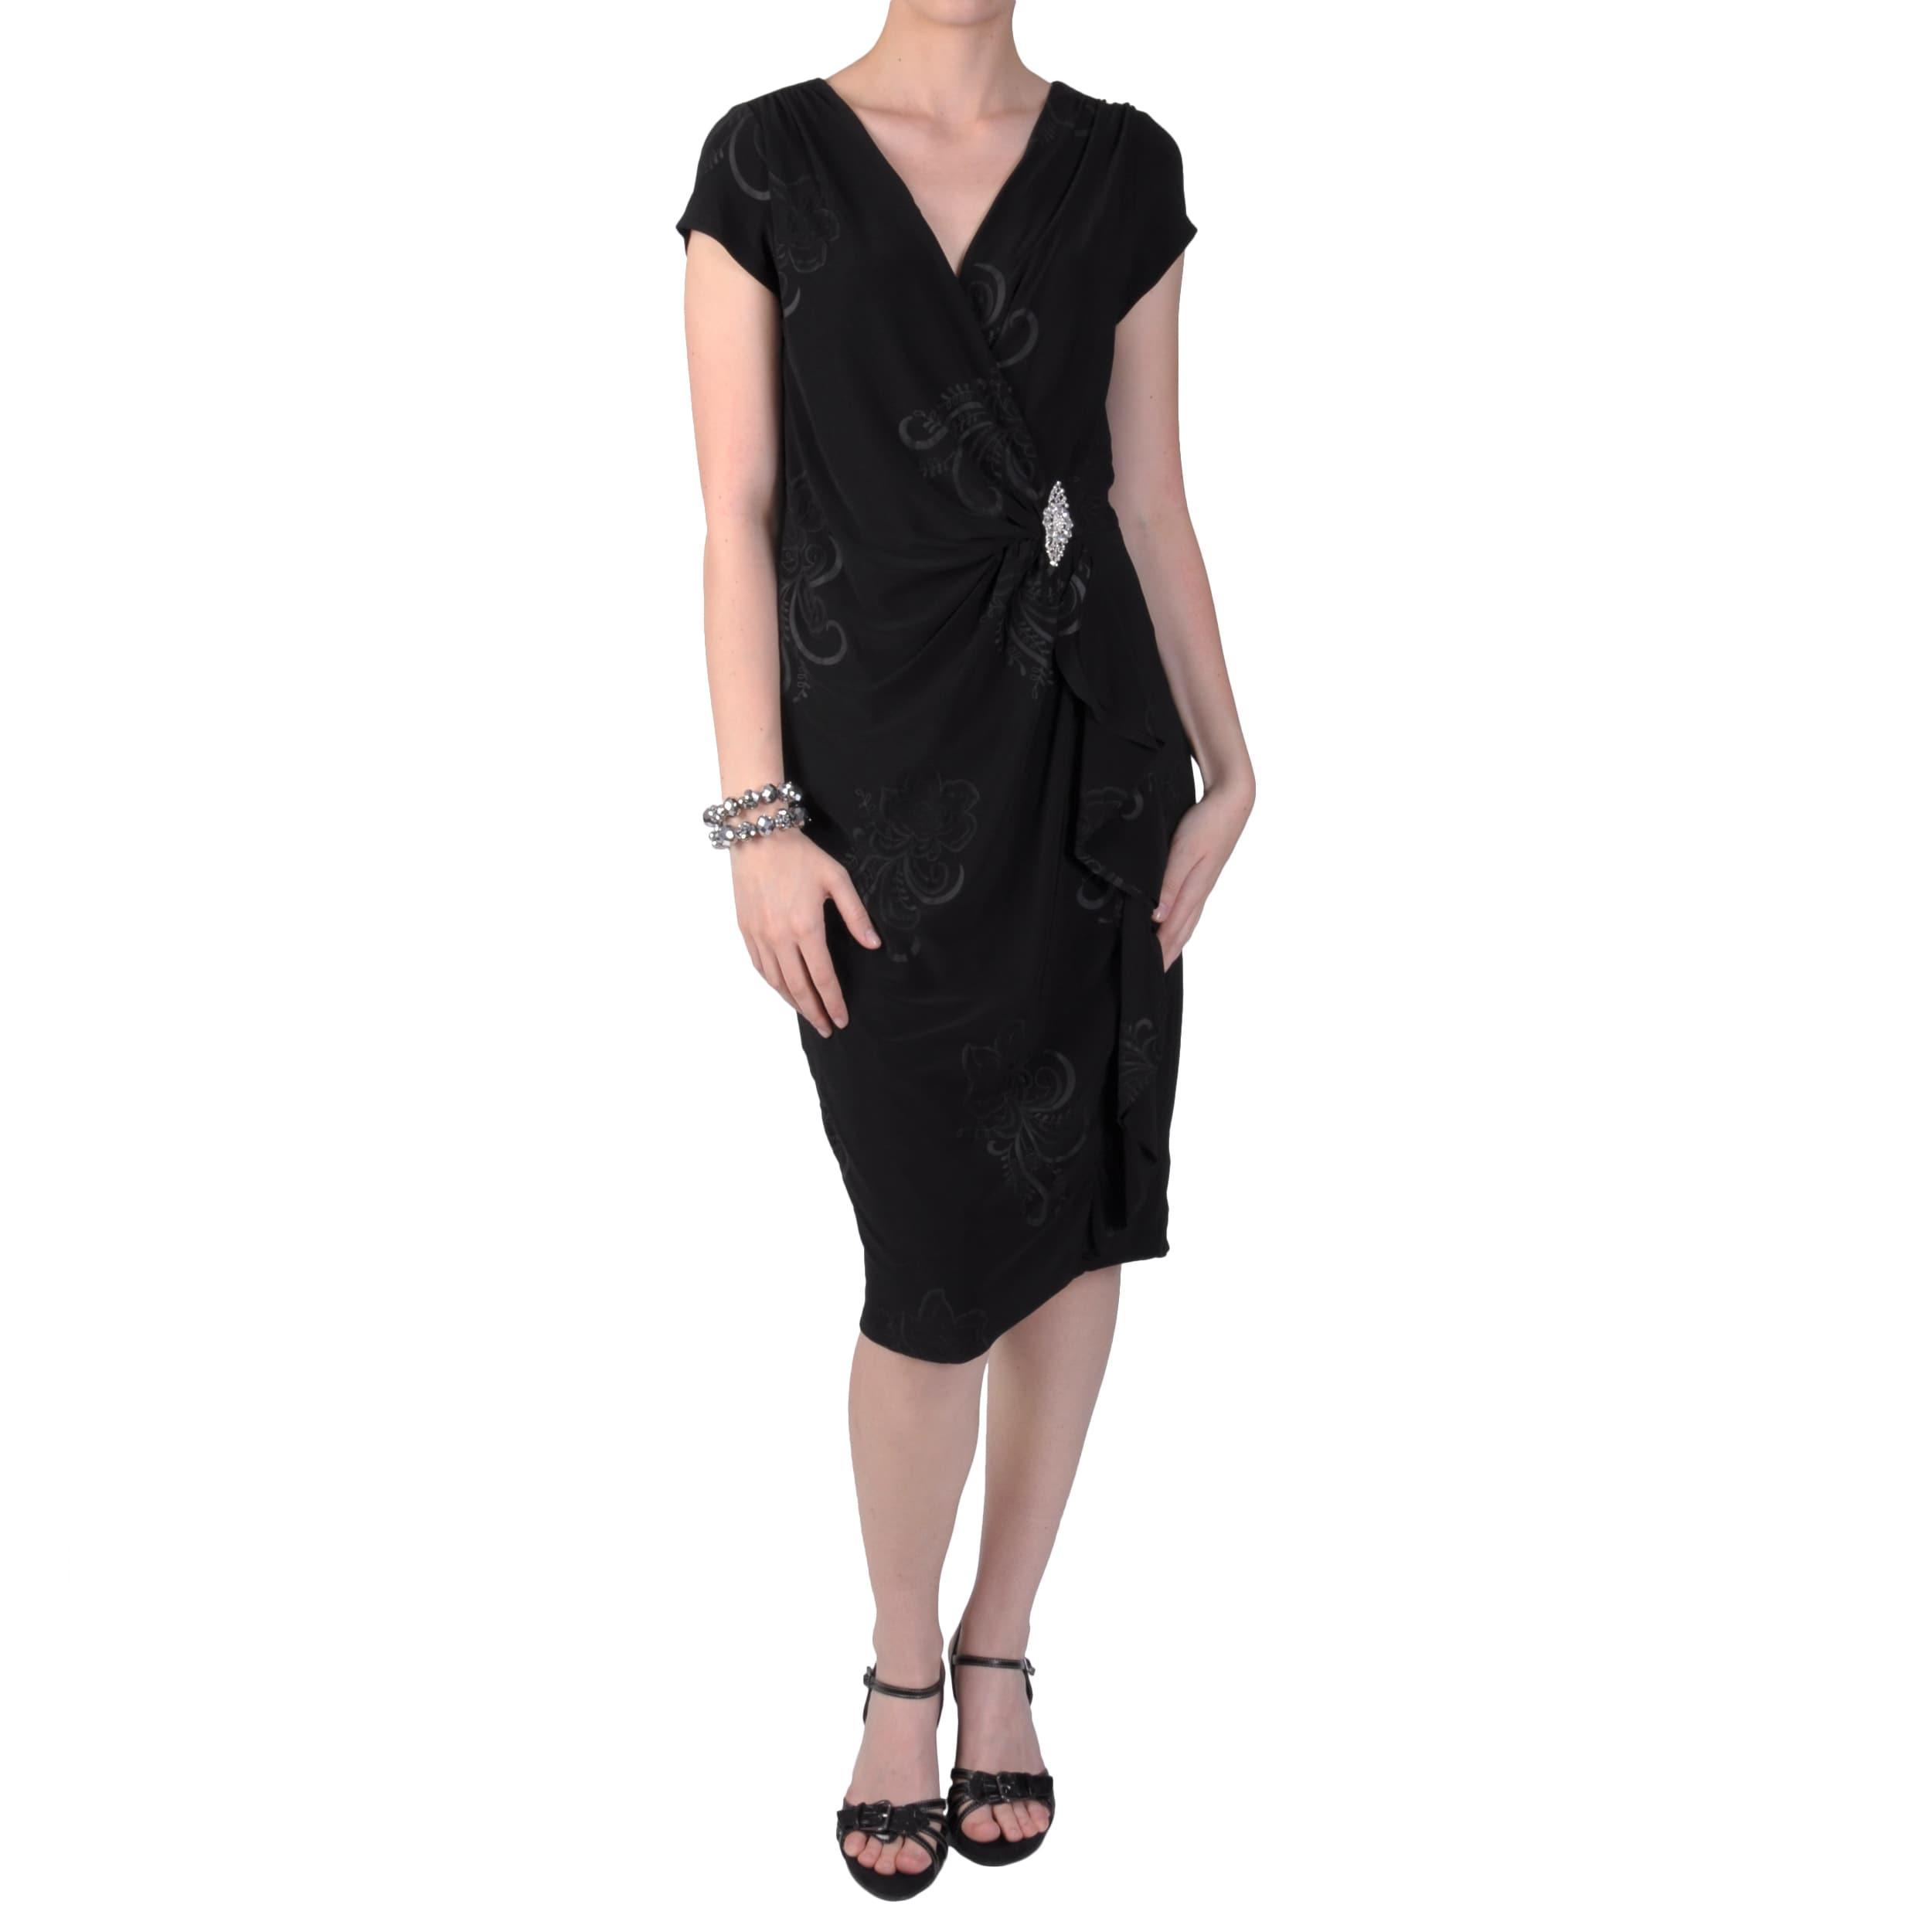 Tressa Designs Women's Ruffled V-neck Short-sleeve Dress